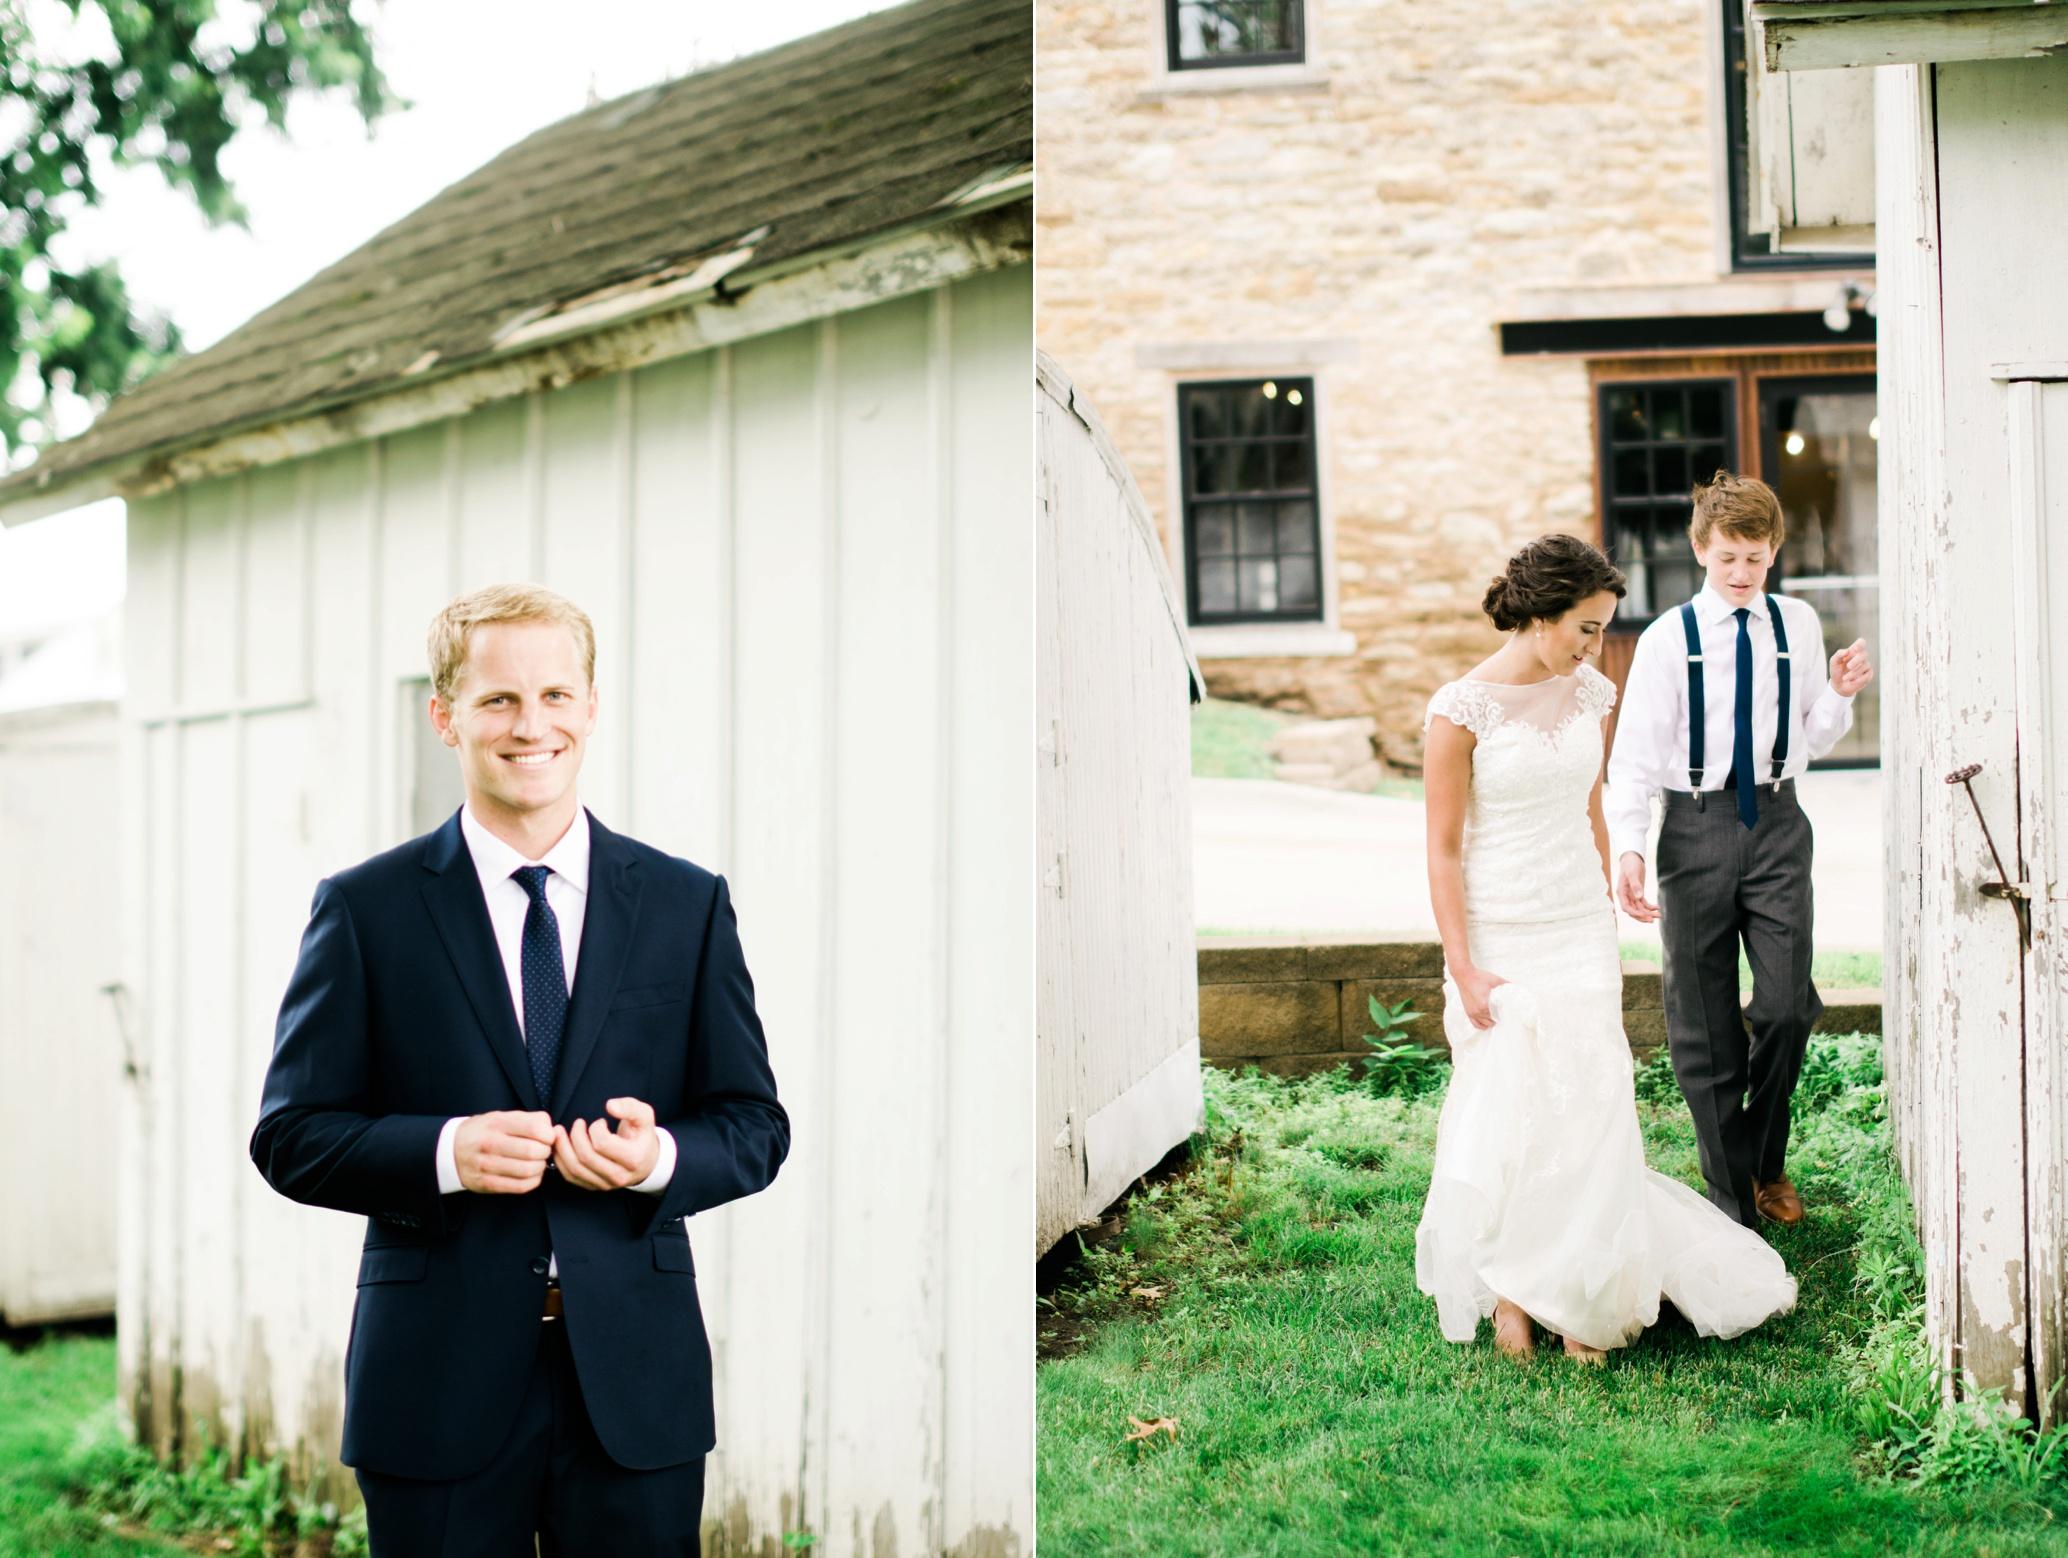 Palmer House and Stable Solon, IA | Ali Leigh Photo Minneapolis Wedding Photographer_0239.jpg